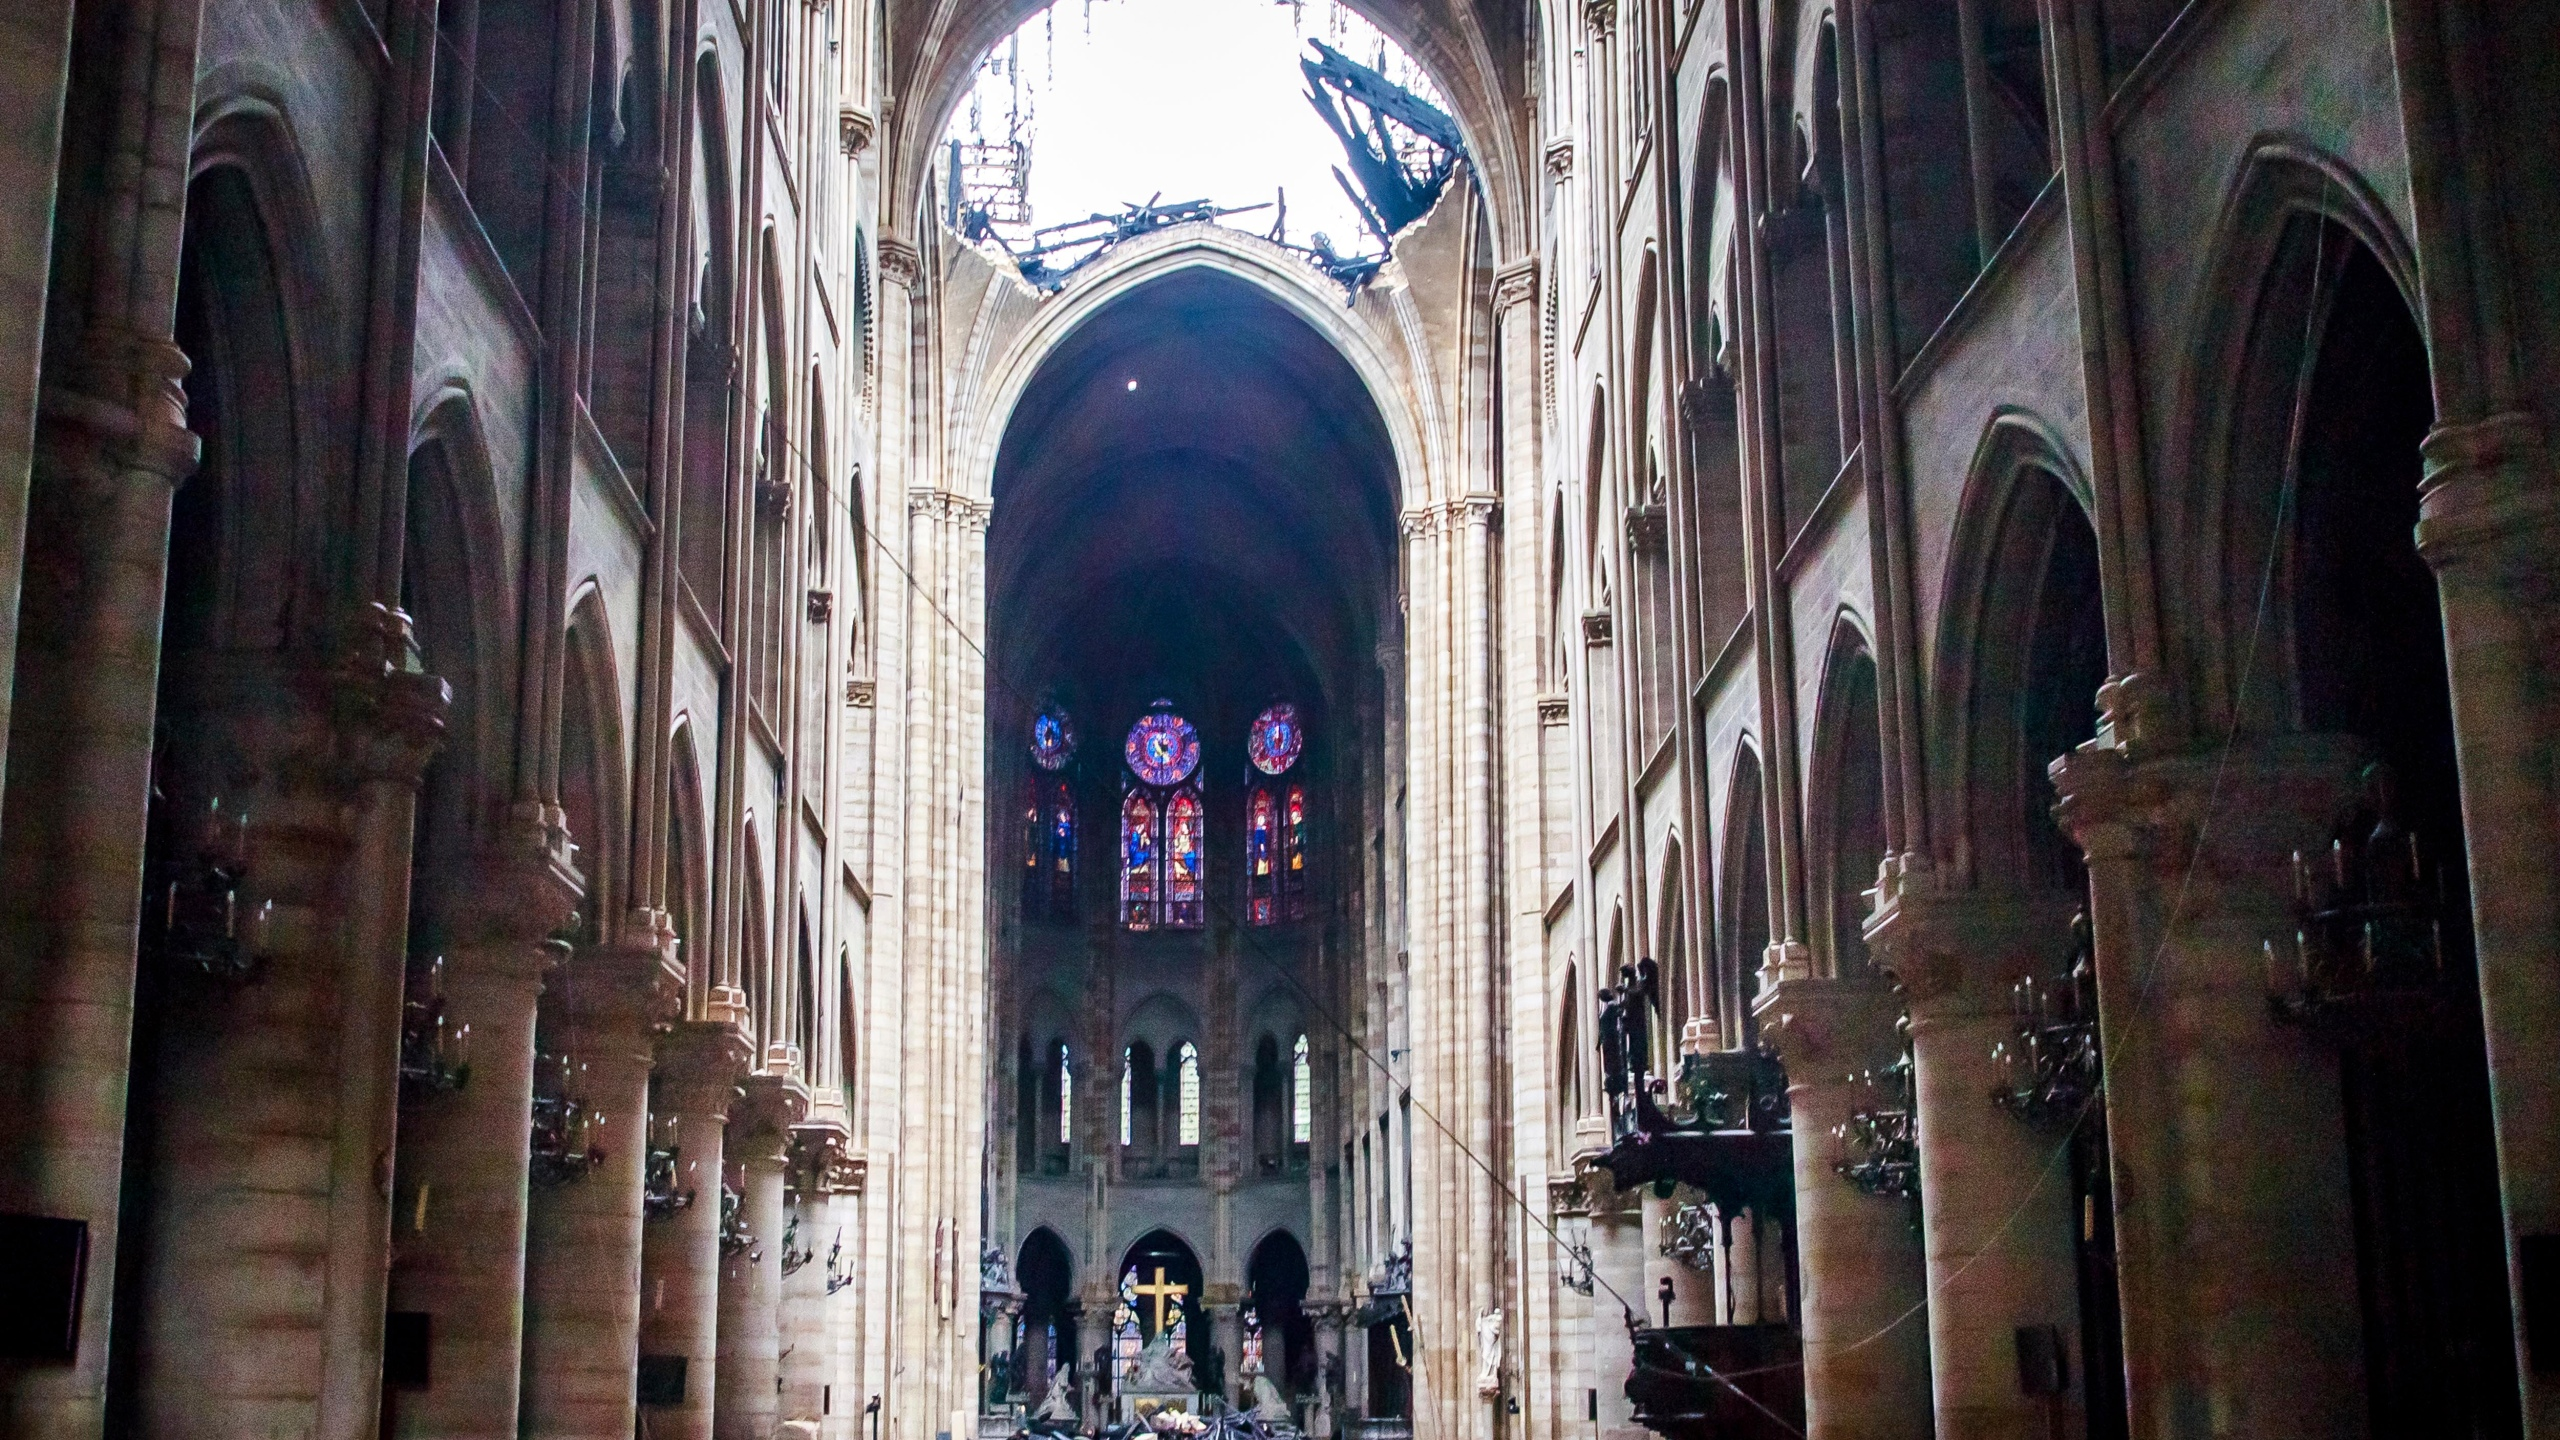 APTOPIX_France_Notre_Dame_Fire_12281-159532.jpg41992875